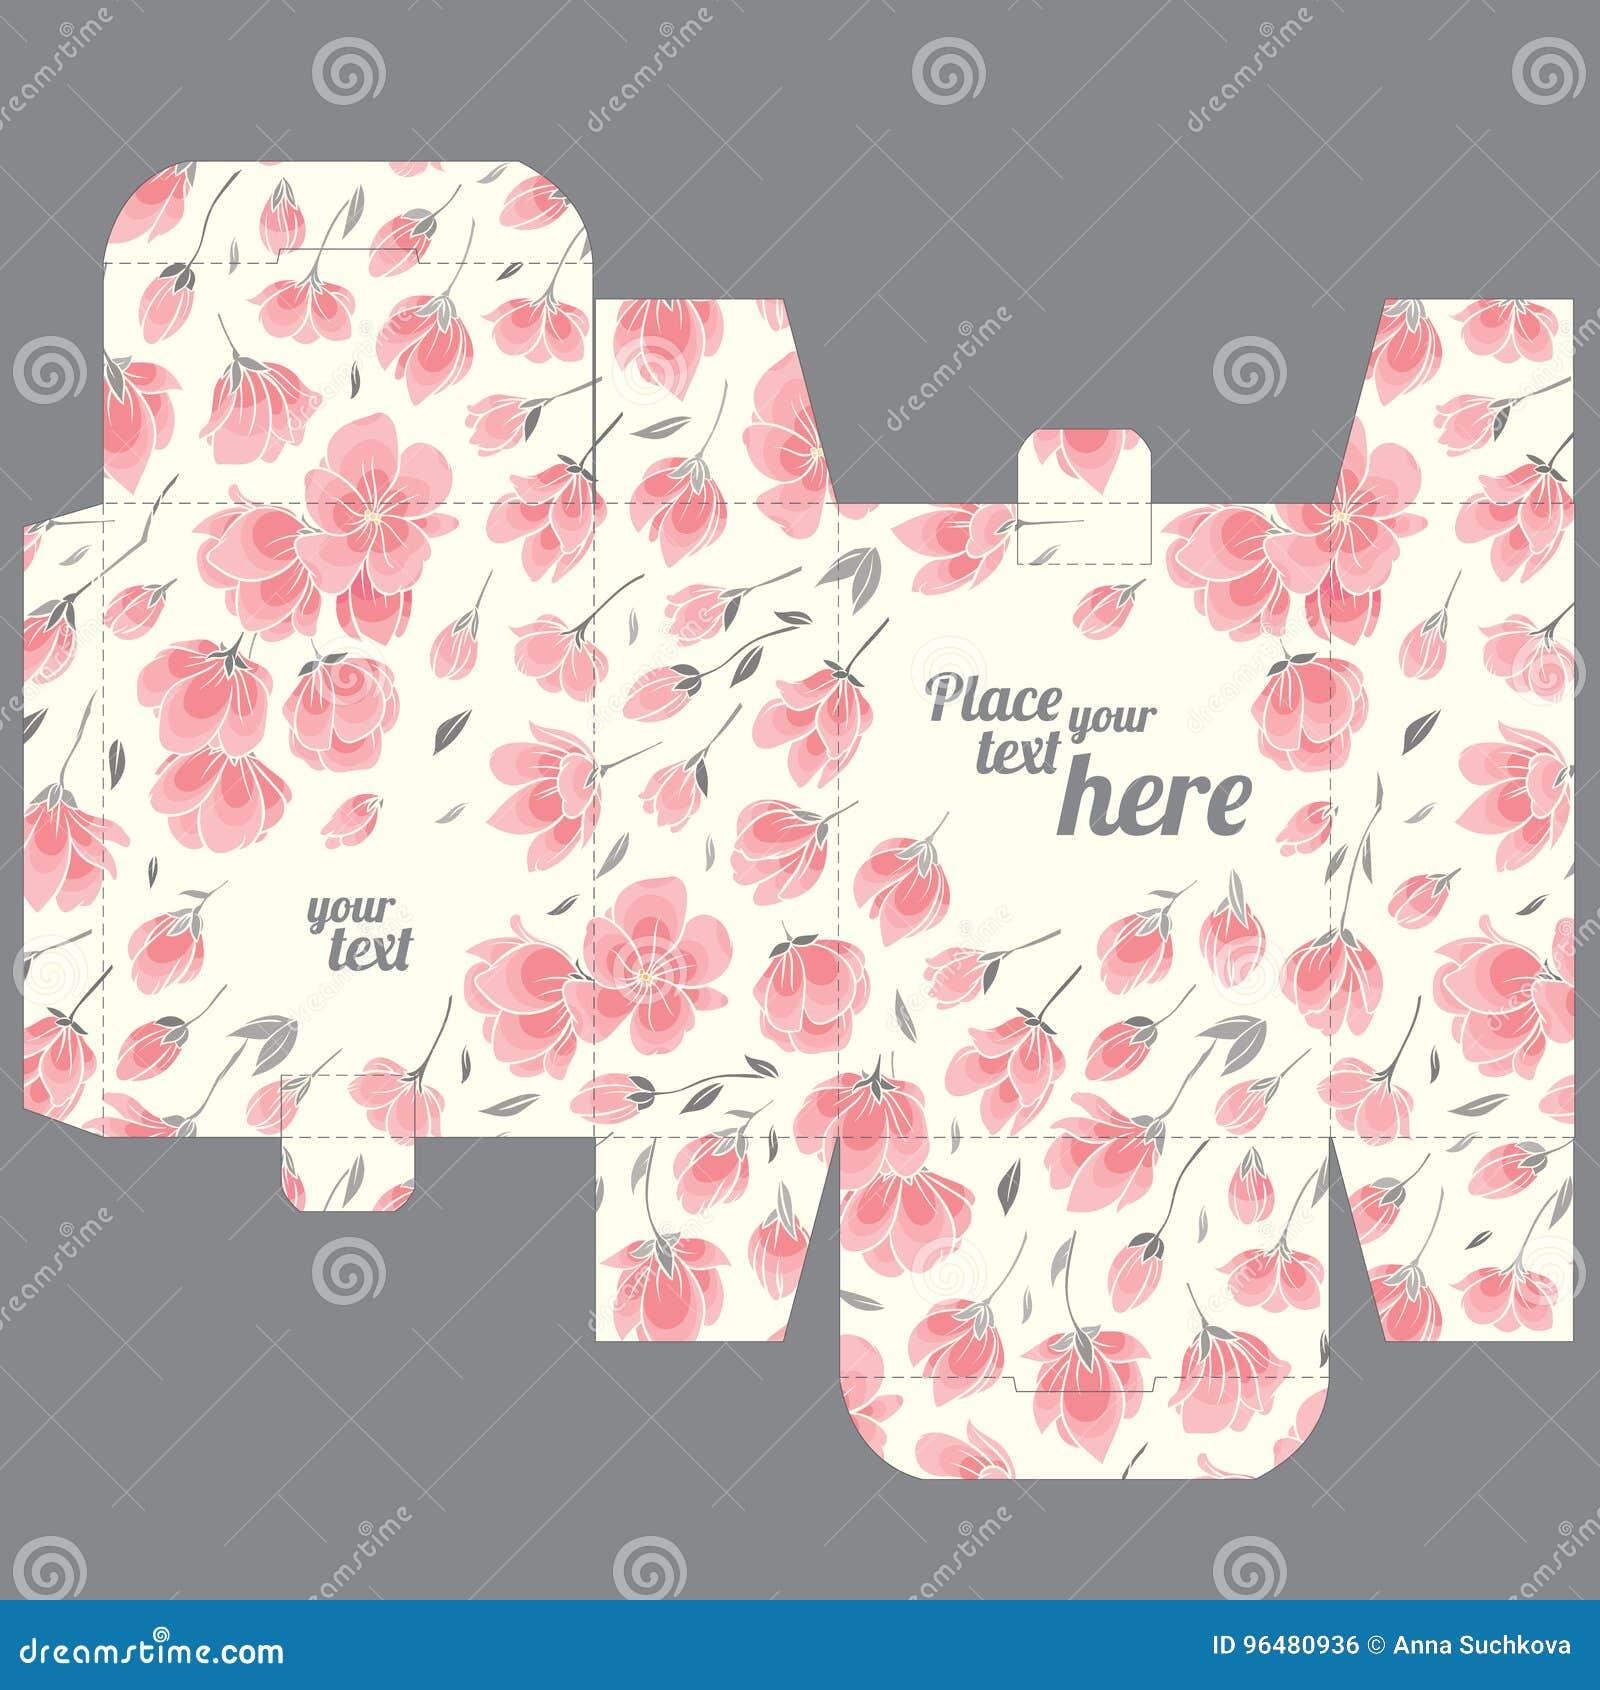 Gift Wedding Favor Die Box Design Template With Sakura Pattern Stock ...